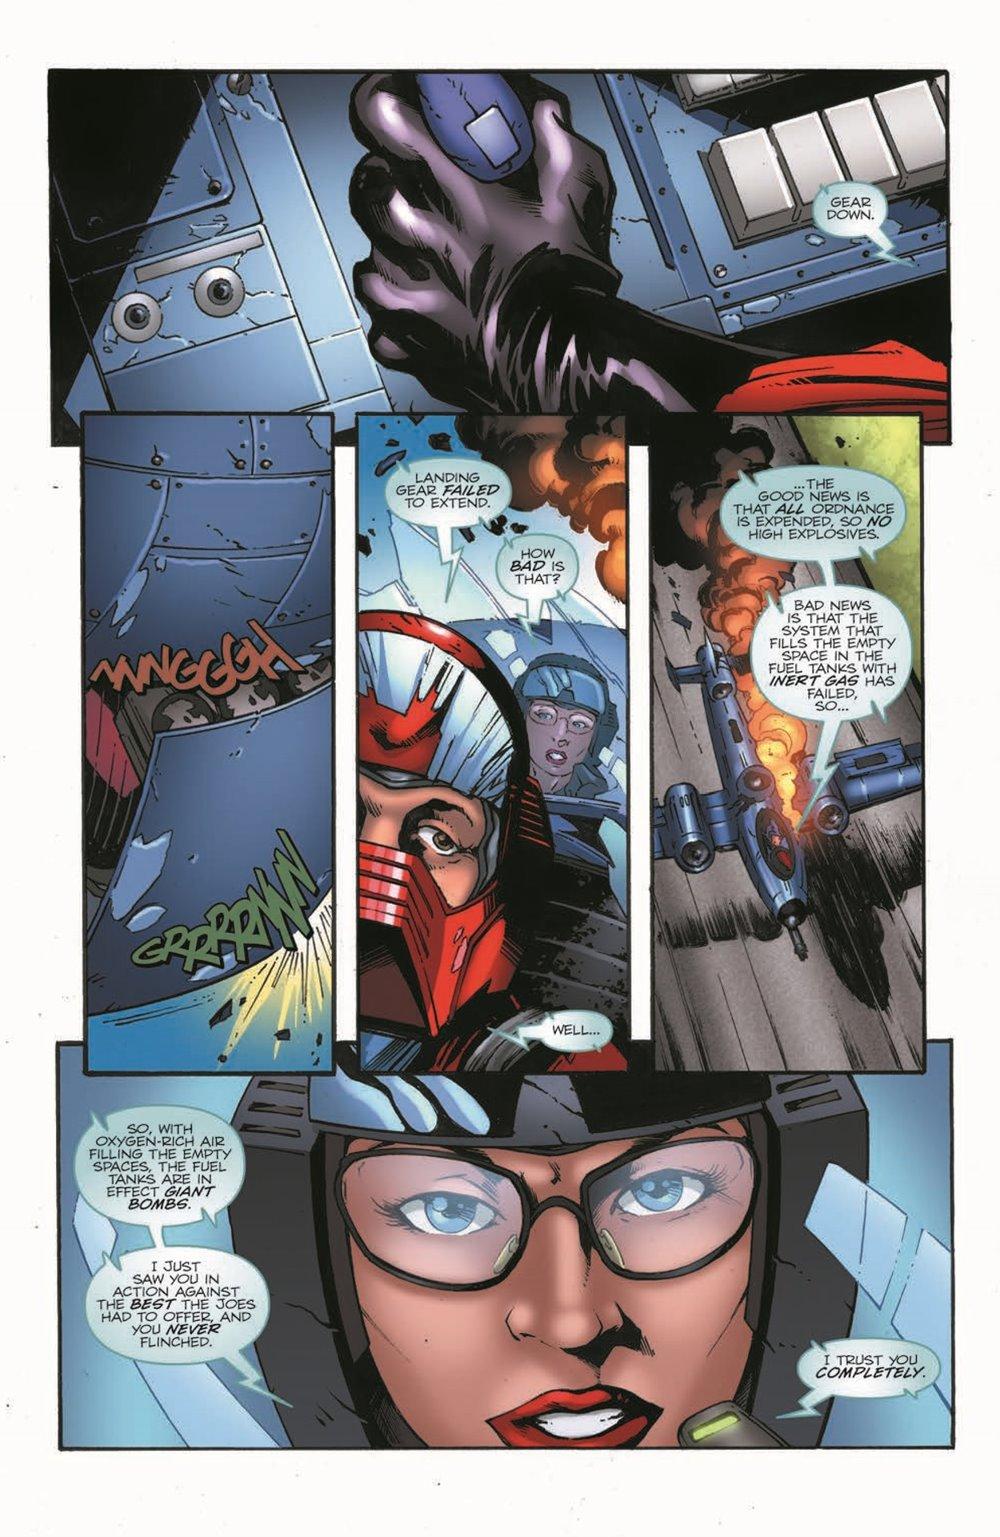 GIJoeRAH280-pr-5 ComicList Previews: G.I. JOE A REAL AMERICAN HERO #280